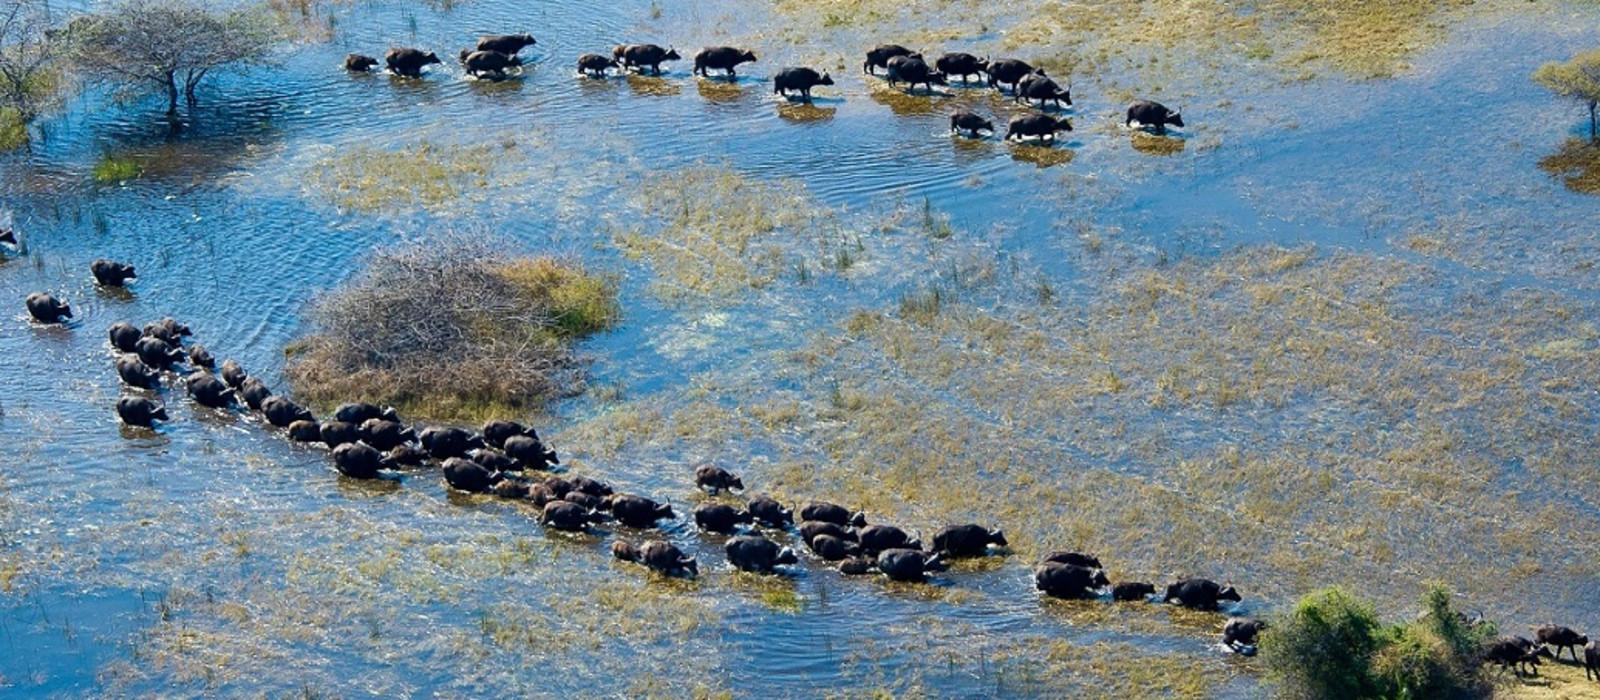 Gnuherde durchquert einen Fluss im Okavango Delta in Botswana